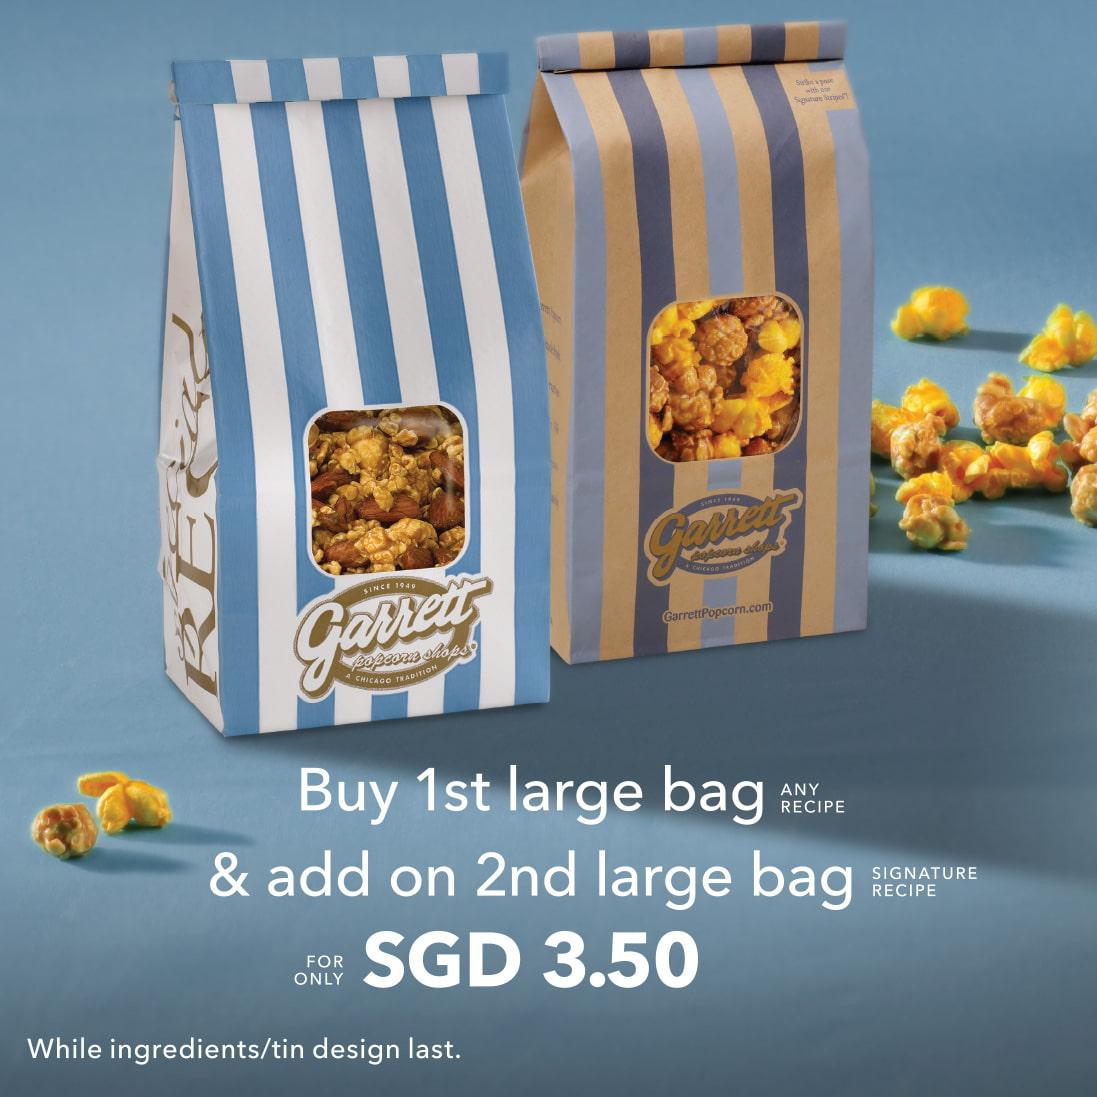 garrett popcorn promotion